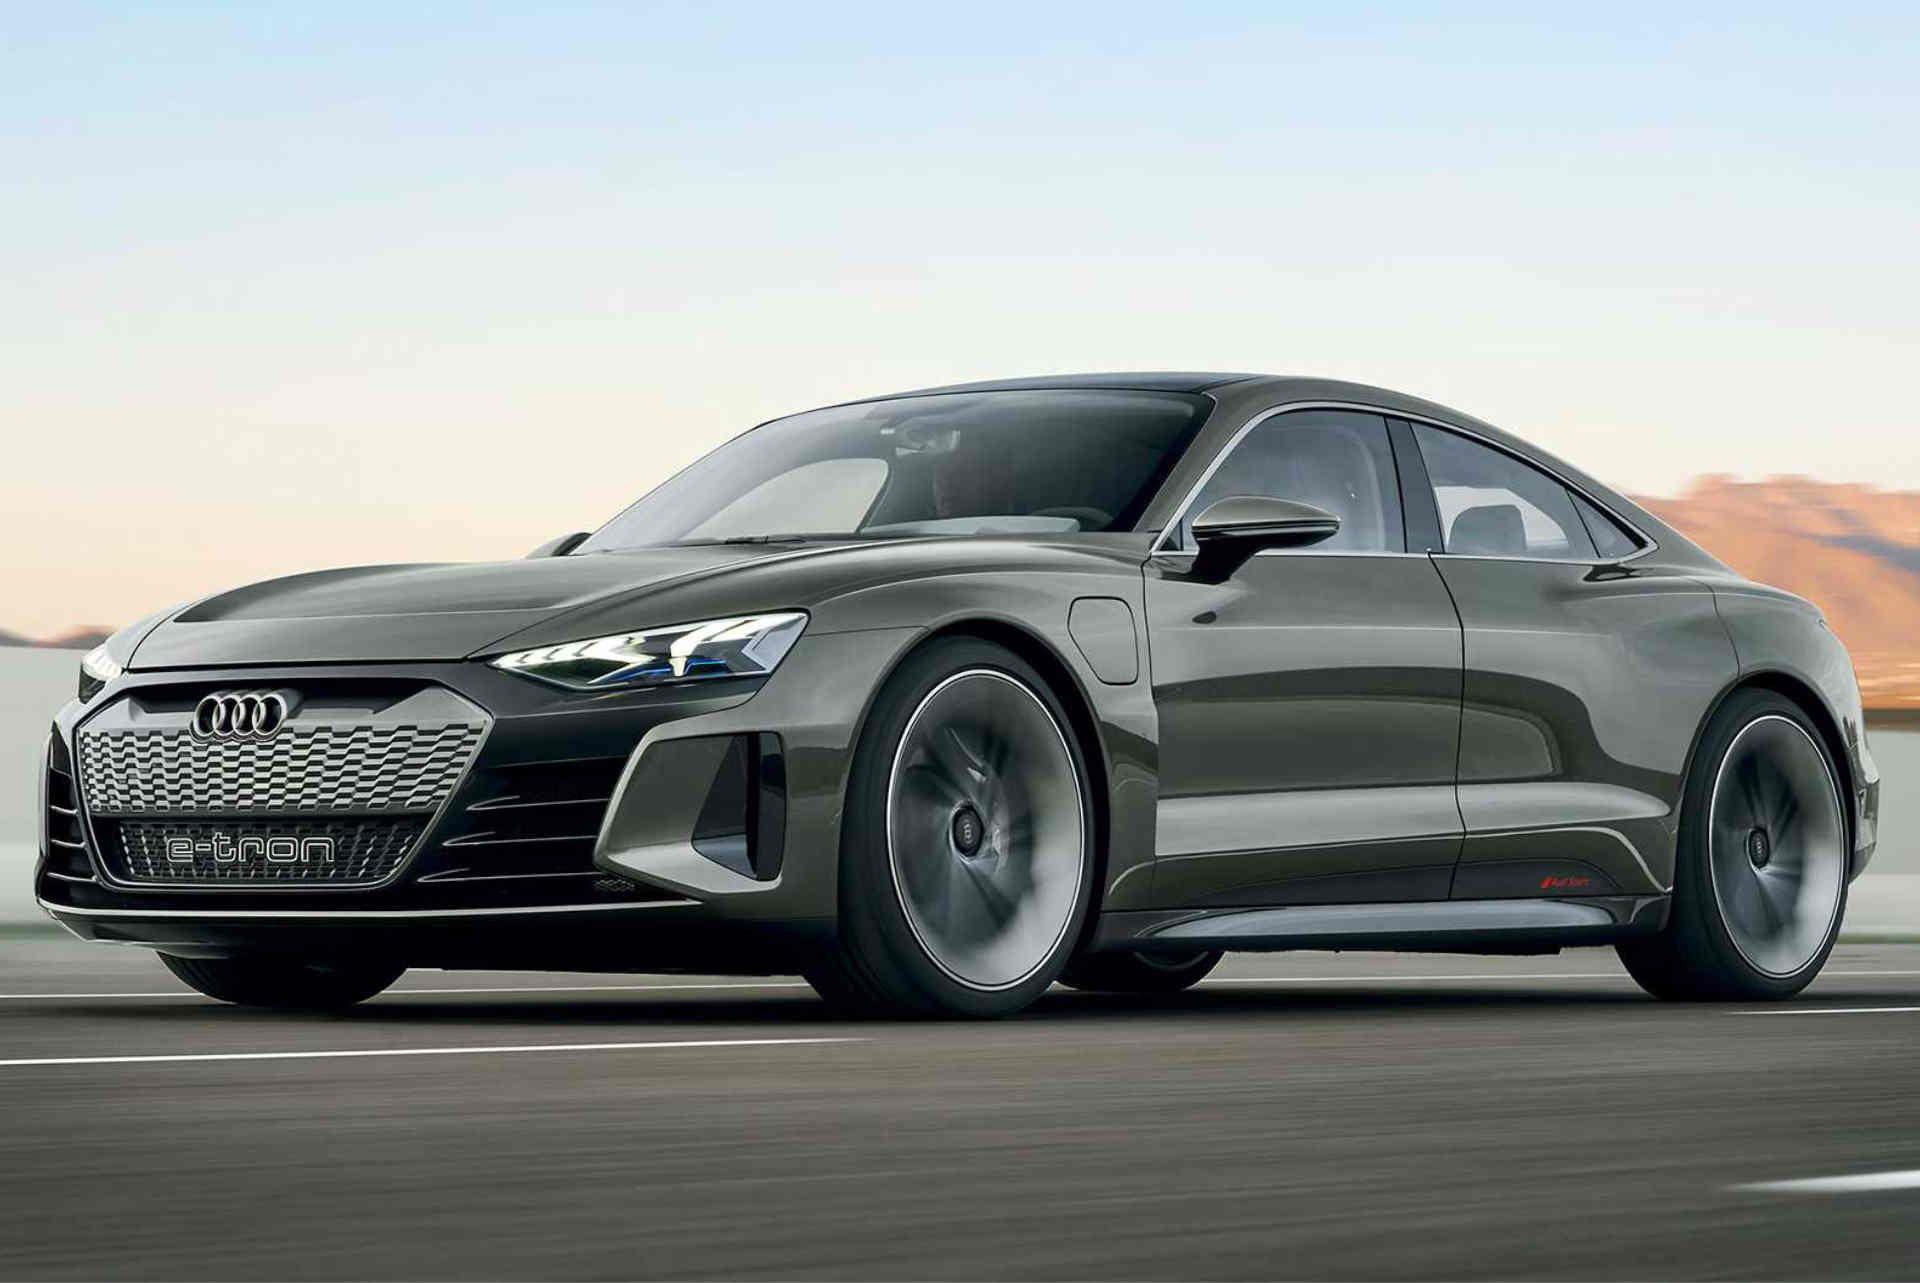 Audi E Tron Sportback In 2020 Audi E Tron New Audi Car Porsche Taycan